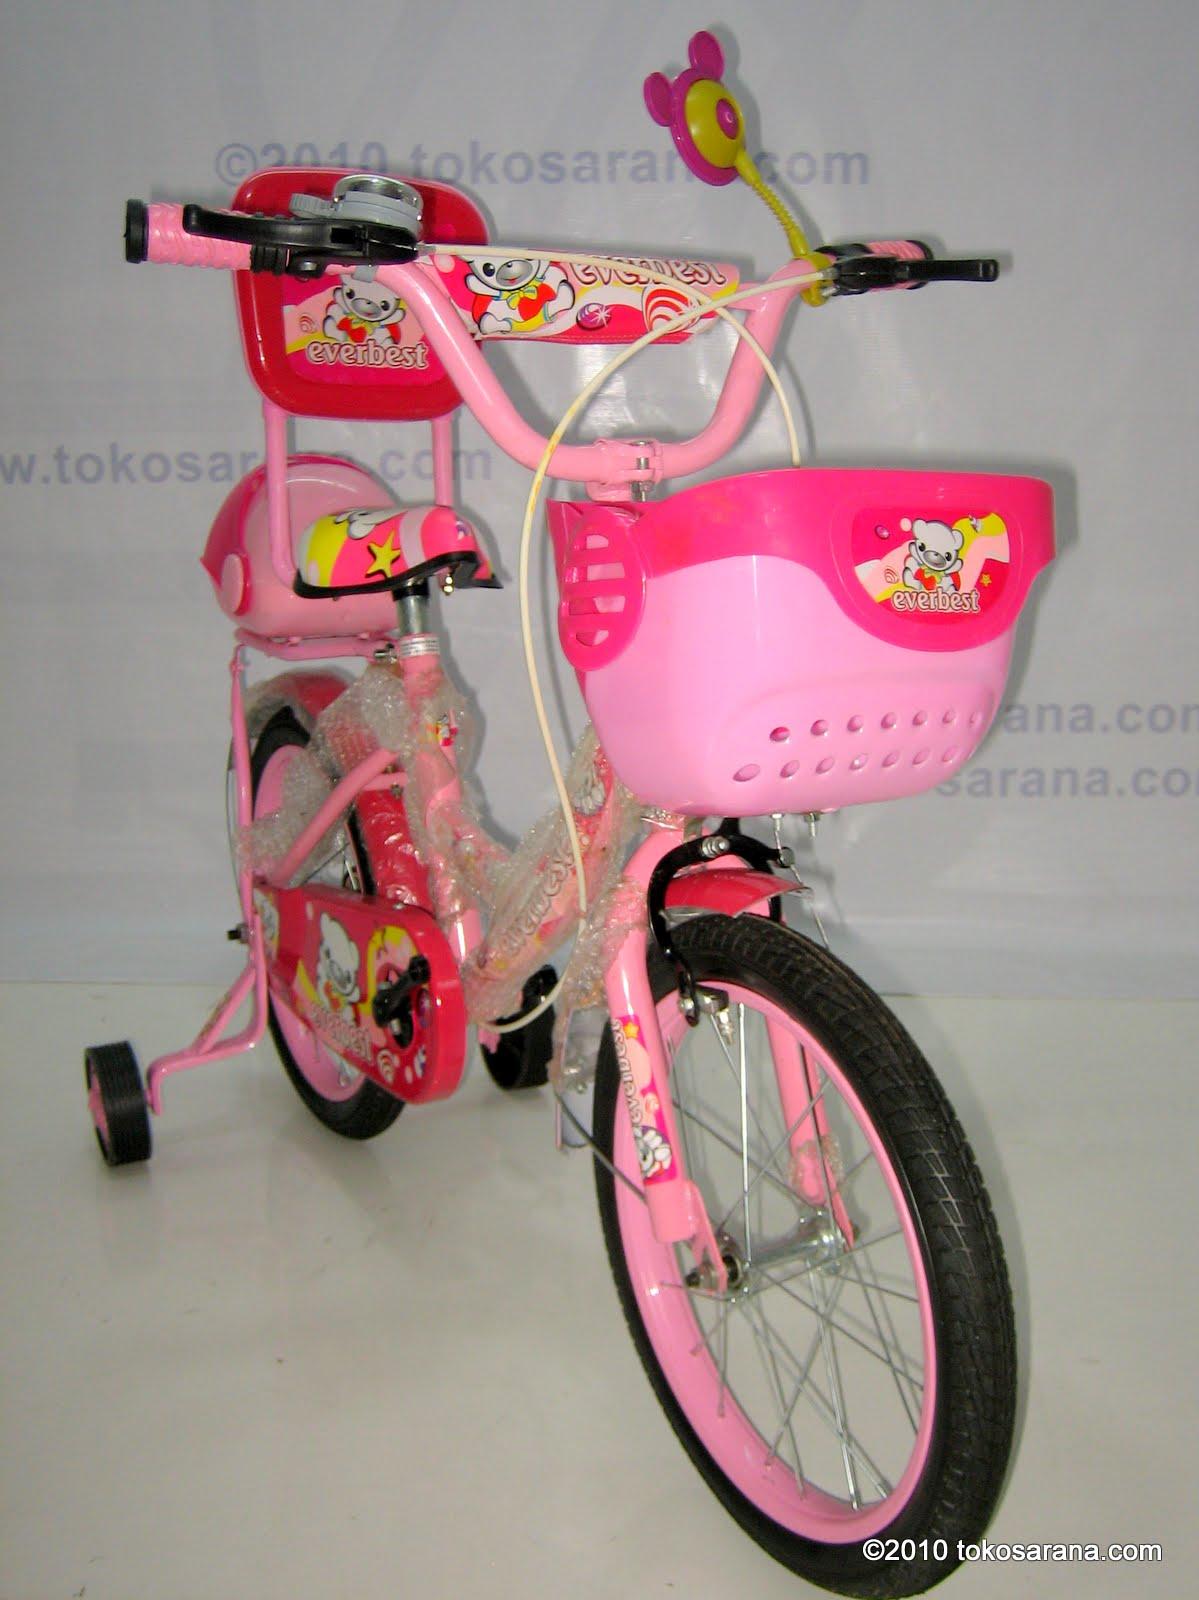 tokosarana™ | Mahasarana Sukses™: Sepeda Anak Everbest 16